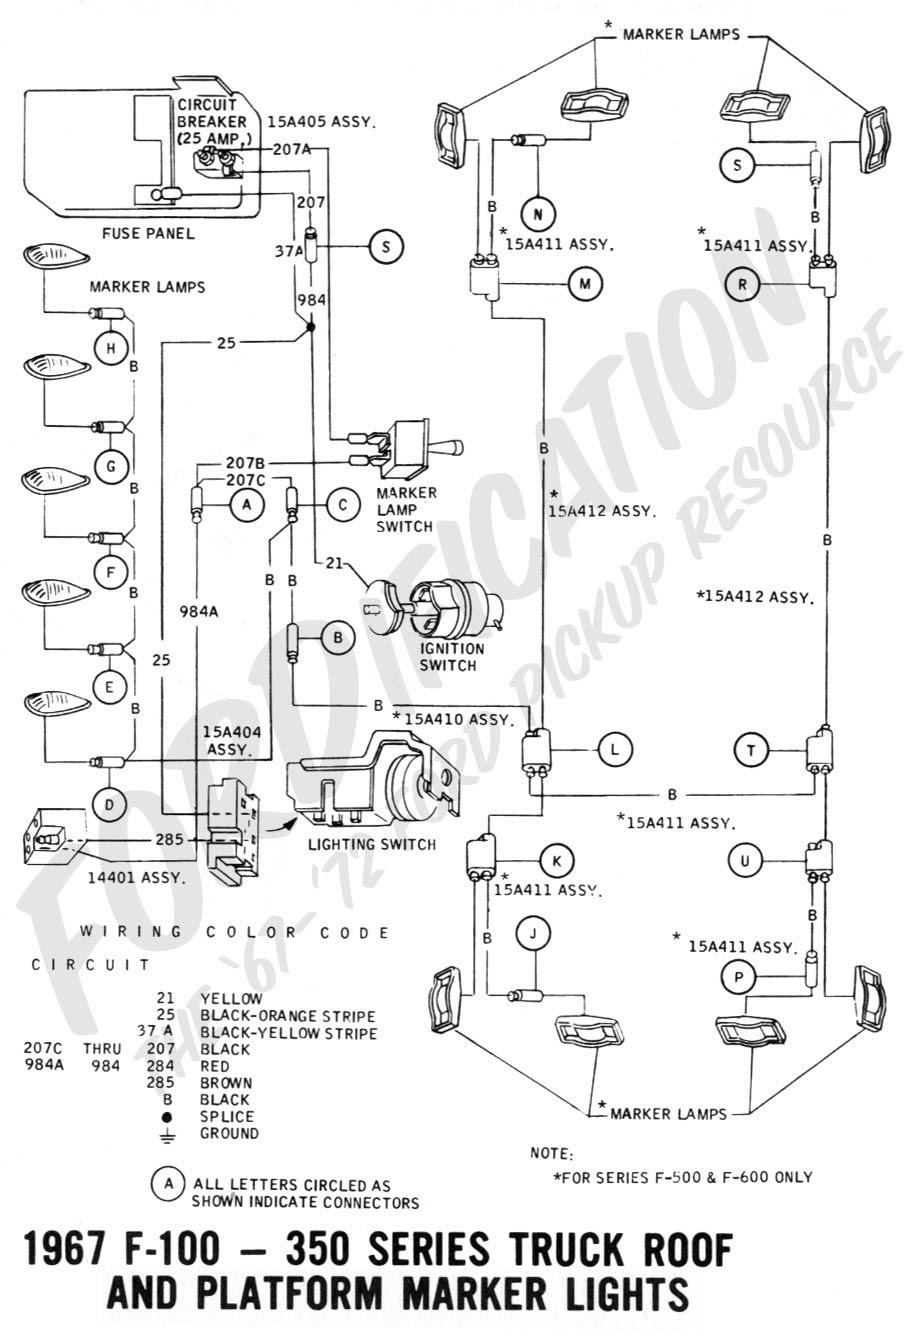 1968 Ford F100 Wiring Schematics Wiring Diagram Local A Local A Maceratadoc It